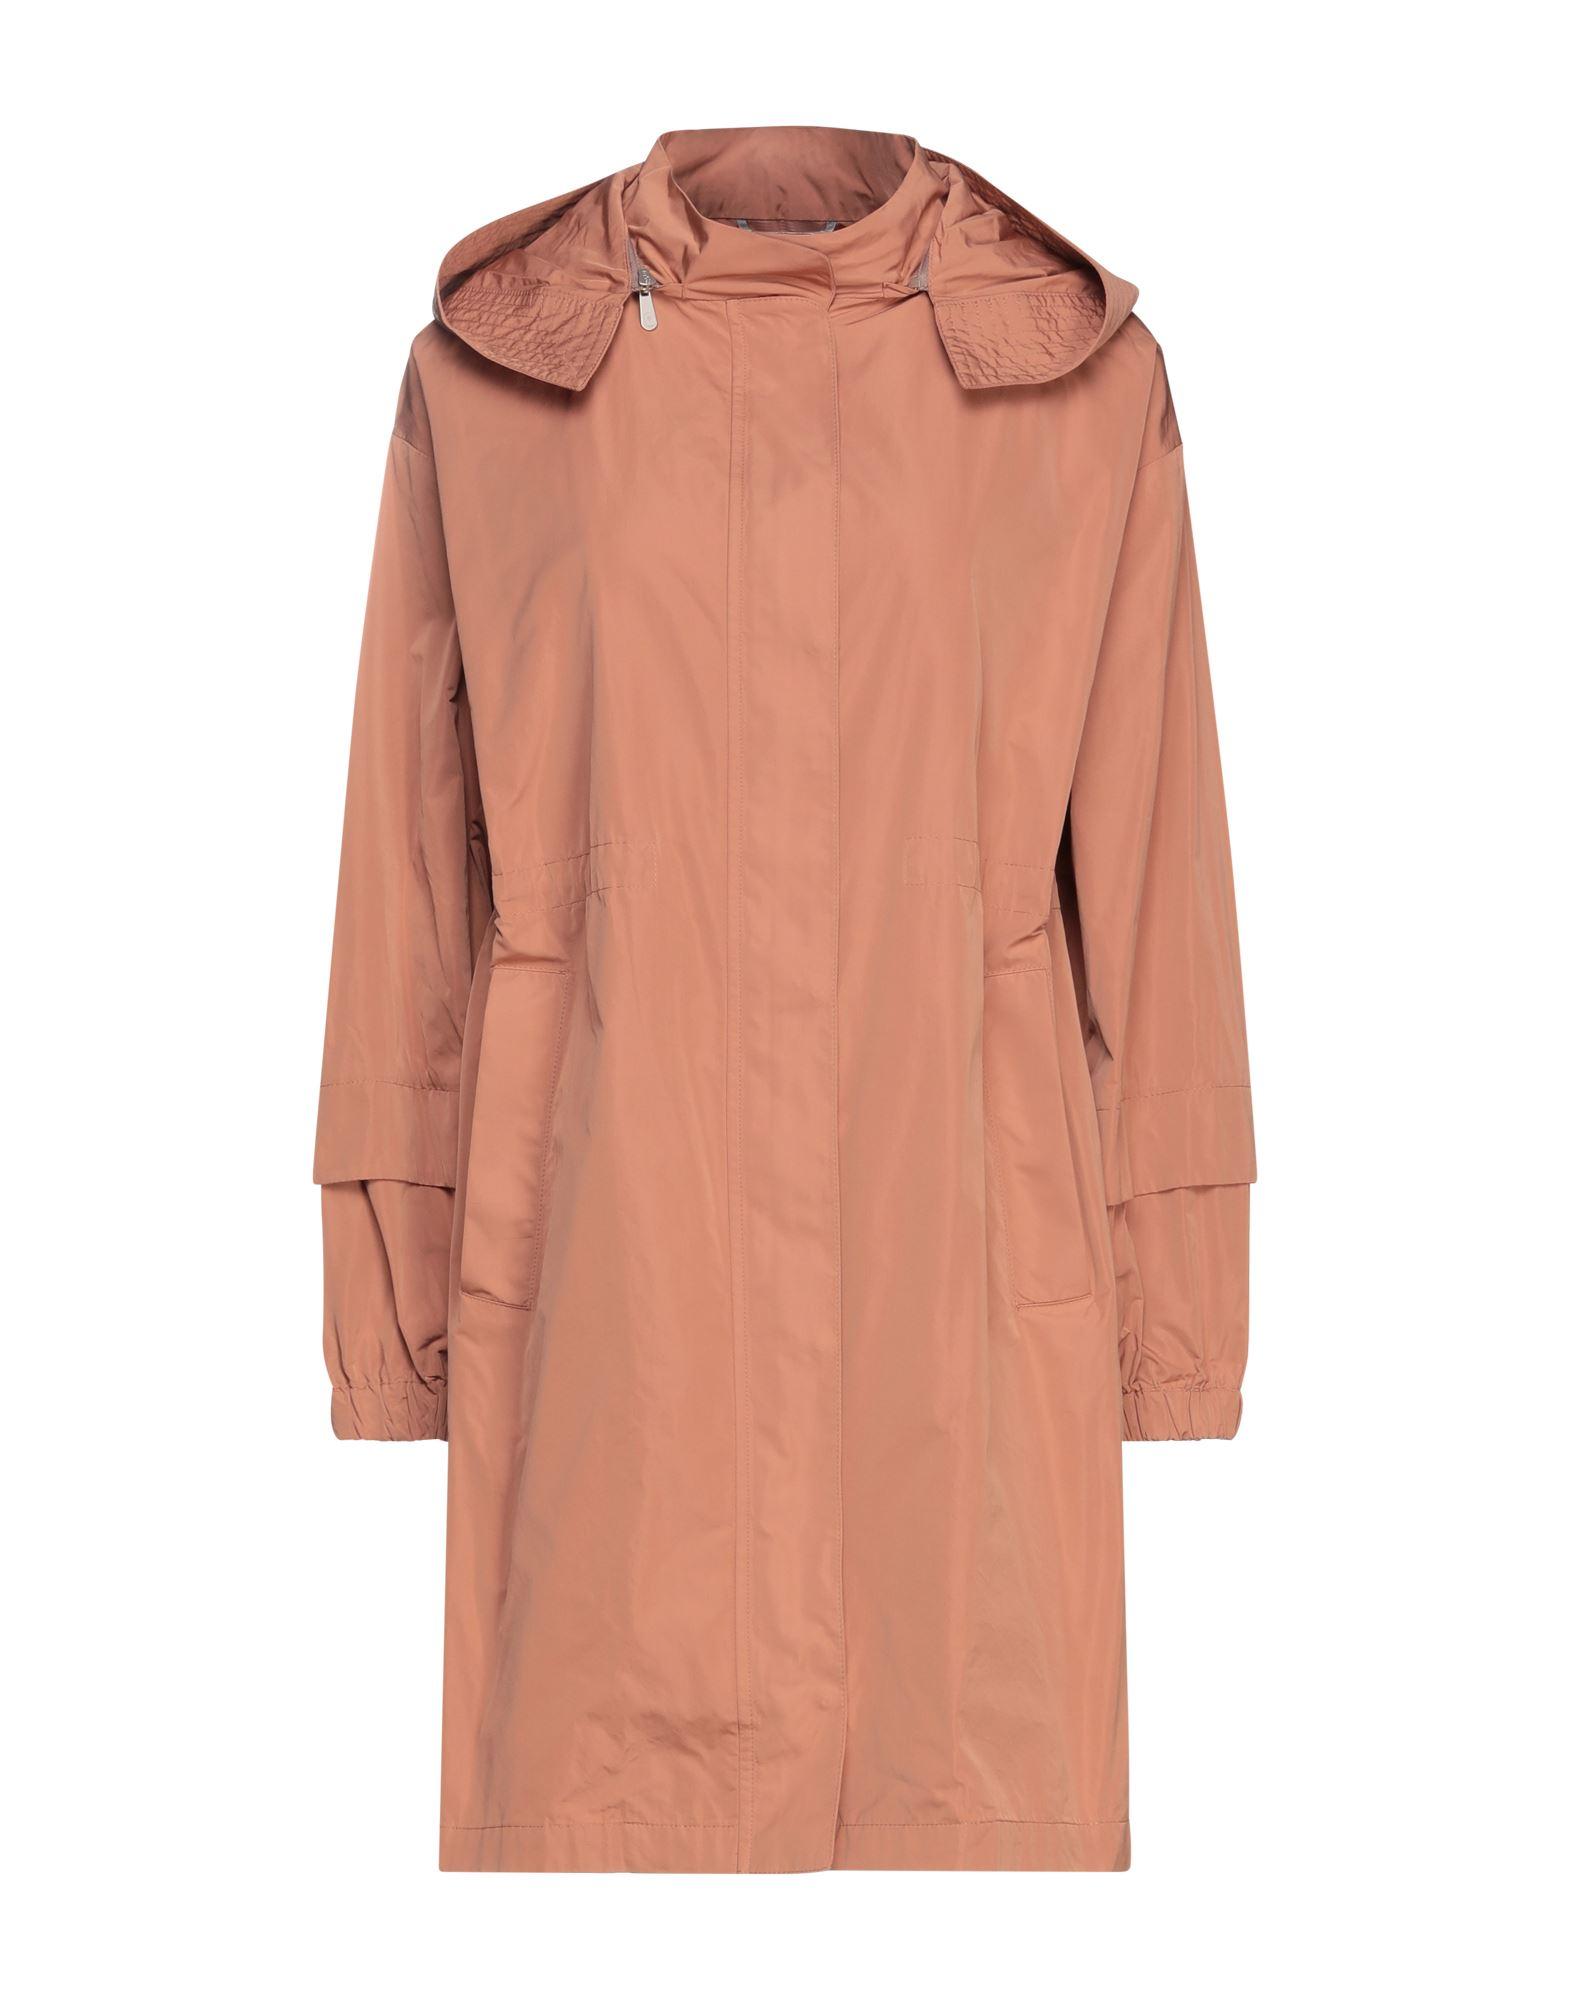 PESERICO Overcoats - Item 41952485